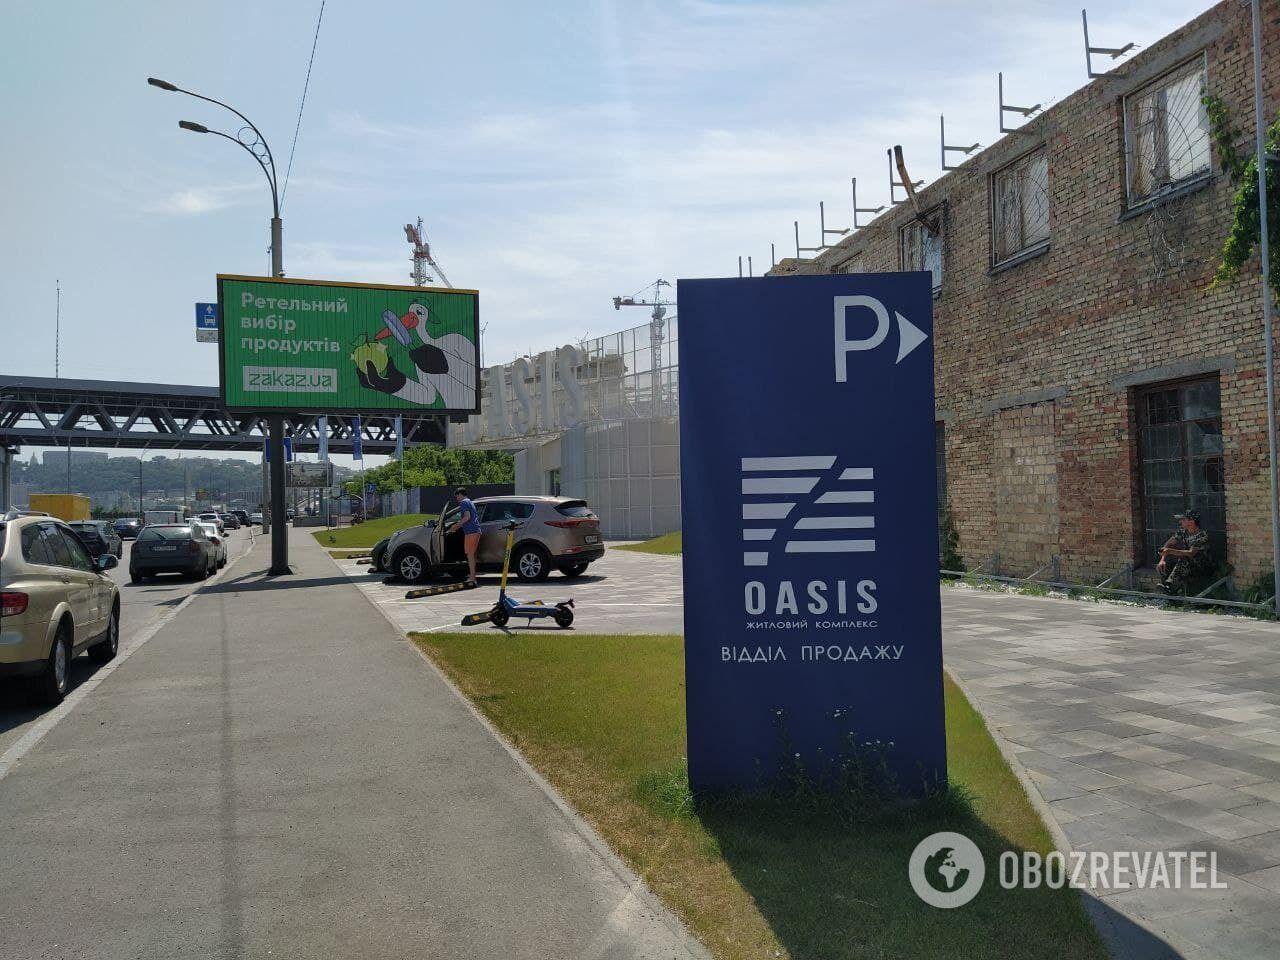 ЖК OASIS зводять на Рибальському острові в Києві